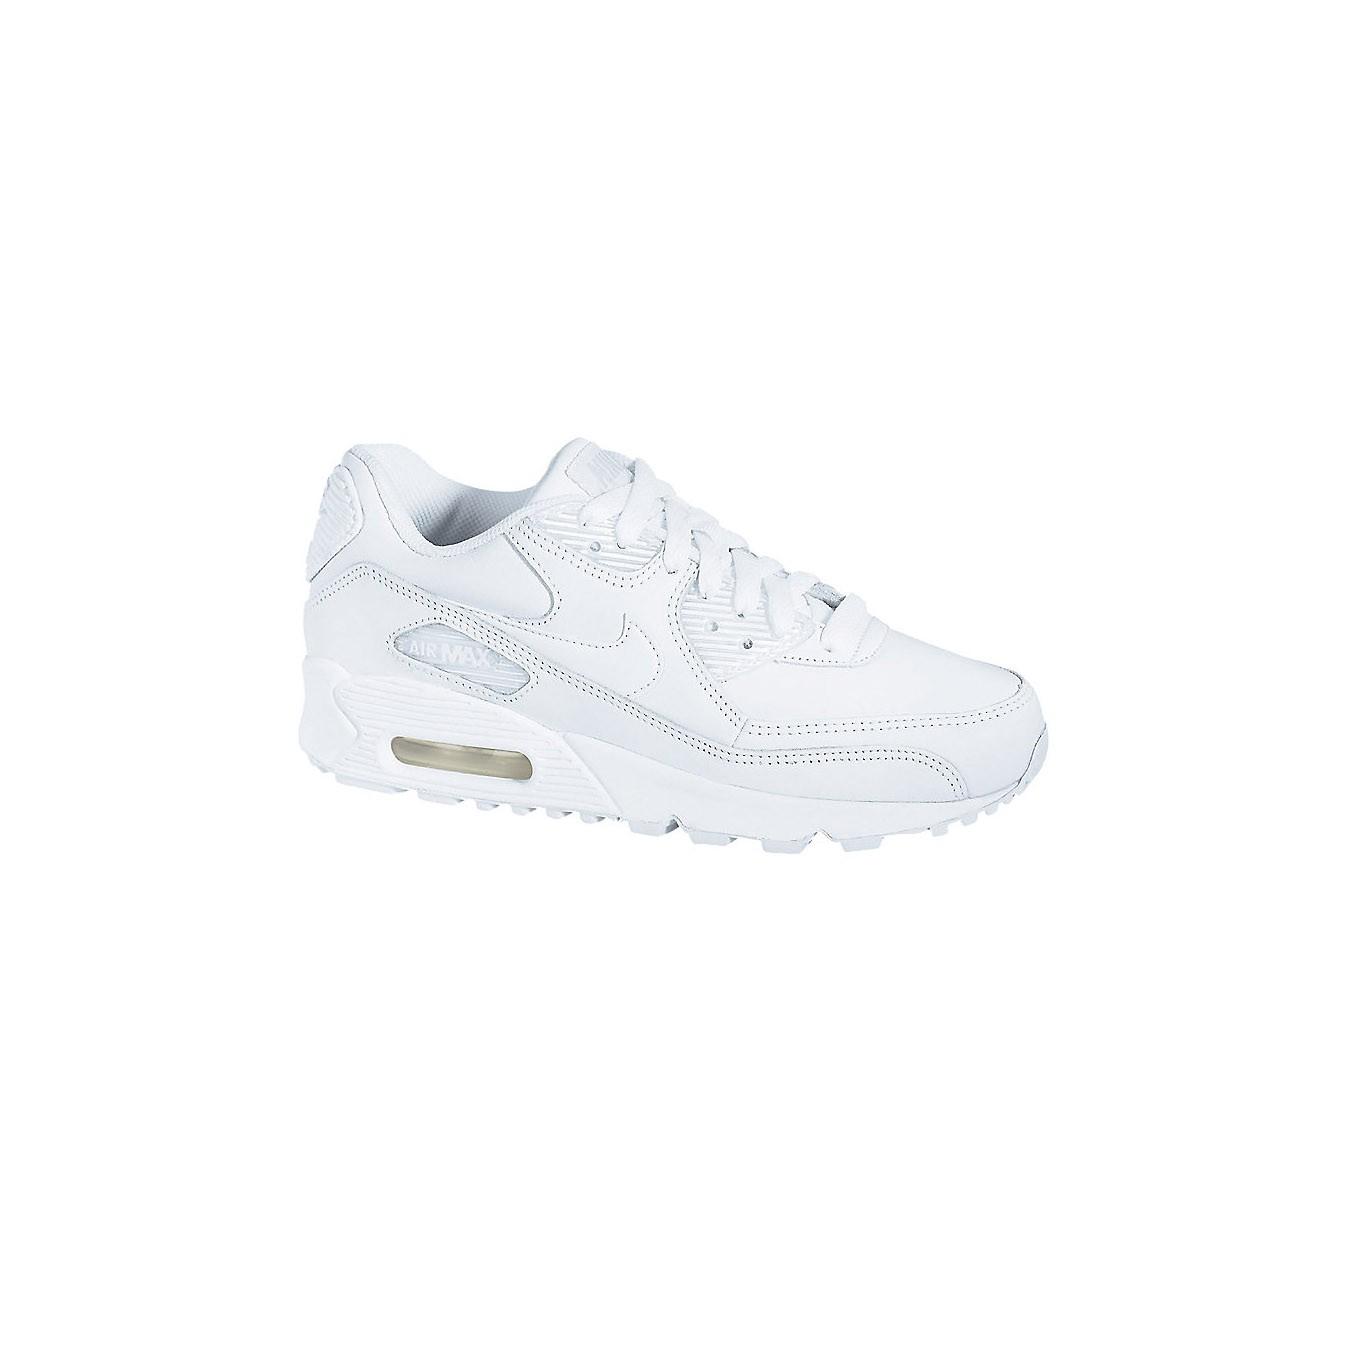 Nike - Air Max 90 Grade School (White | White) | KicksUSA.com